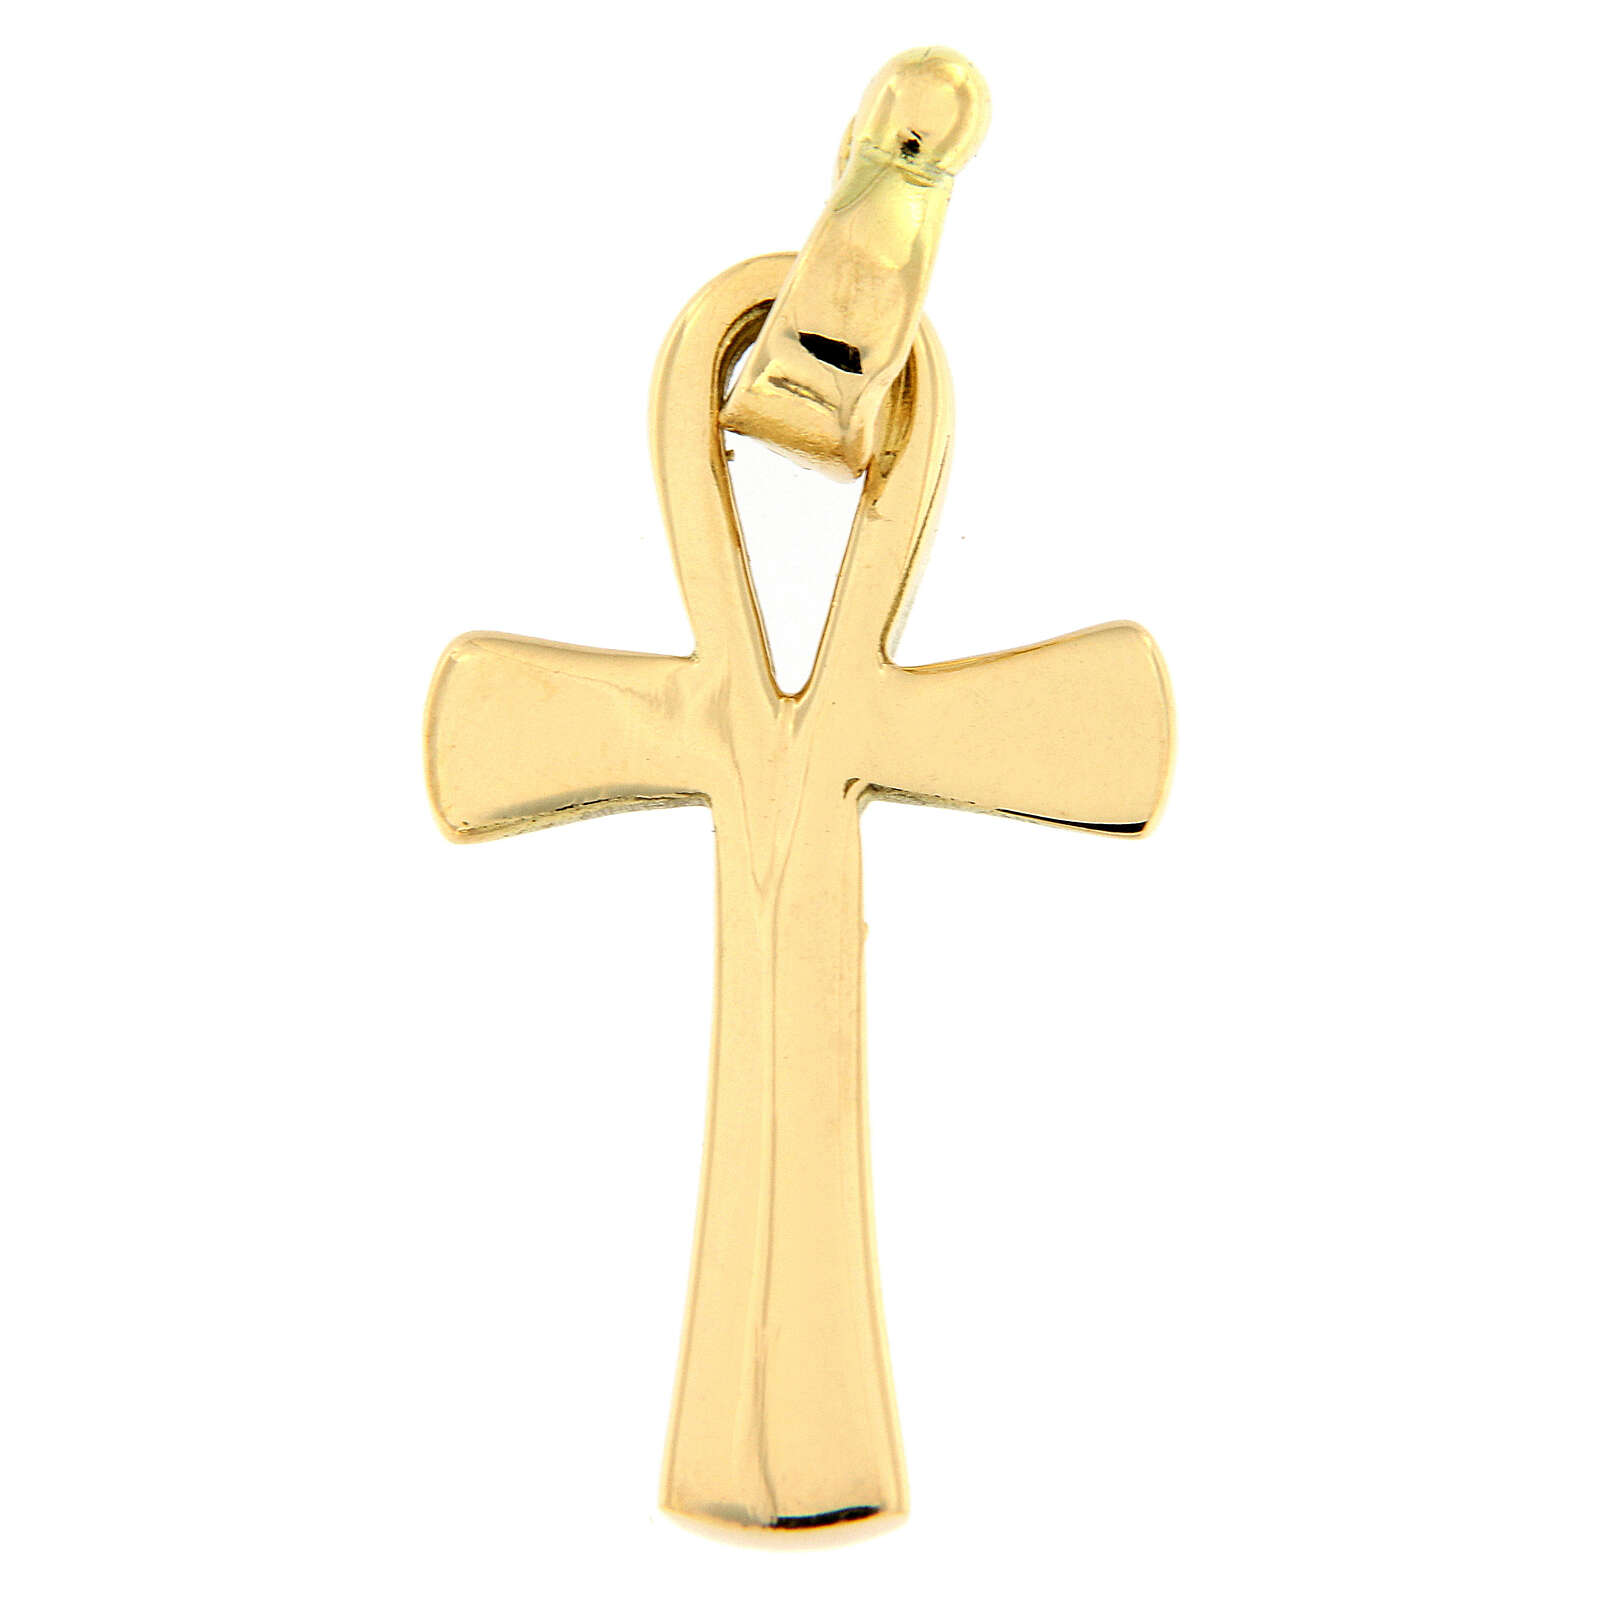 Colgante cruz de la vida oro lúcido 18 quilates 2,2 gr 4